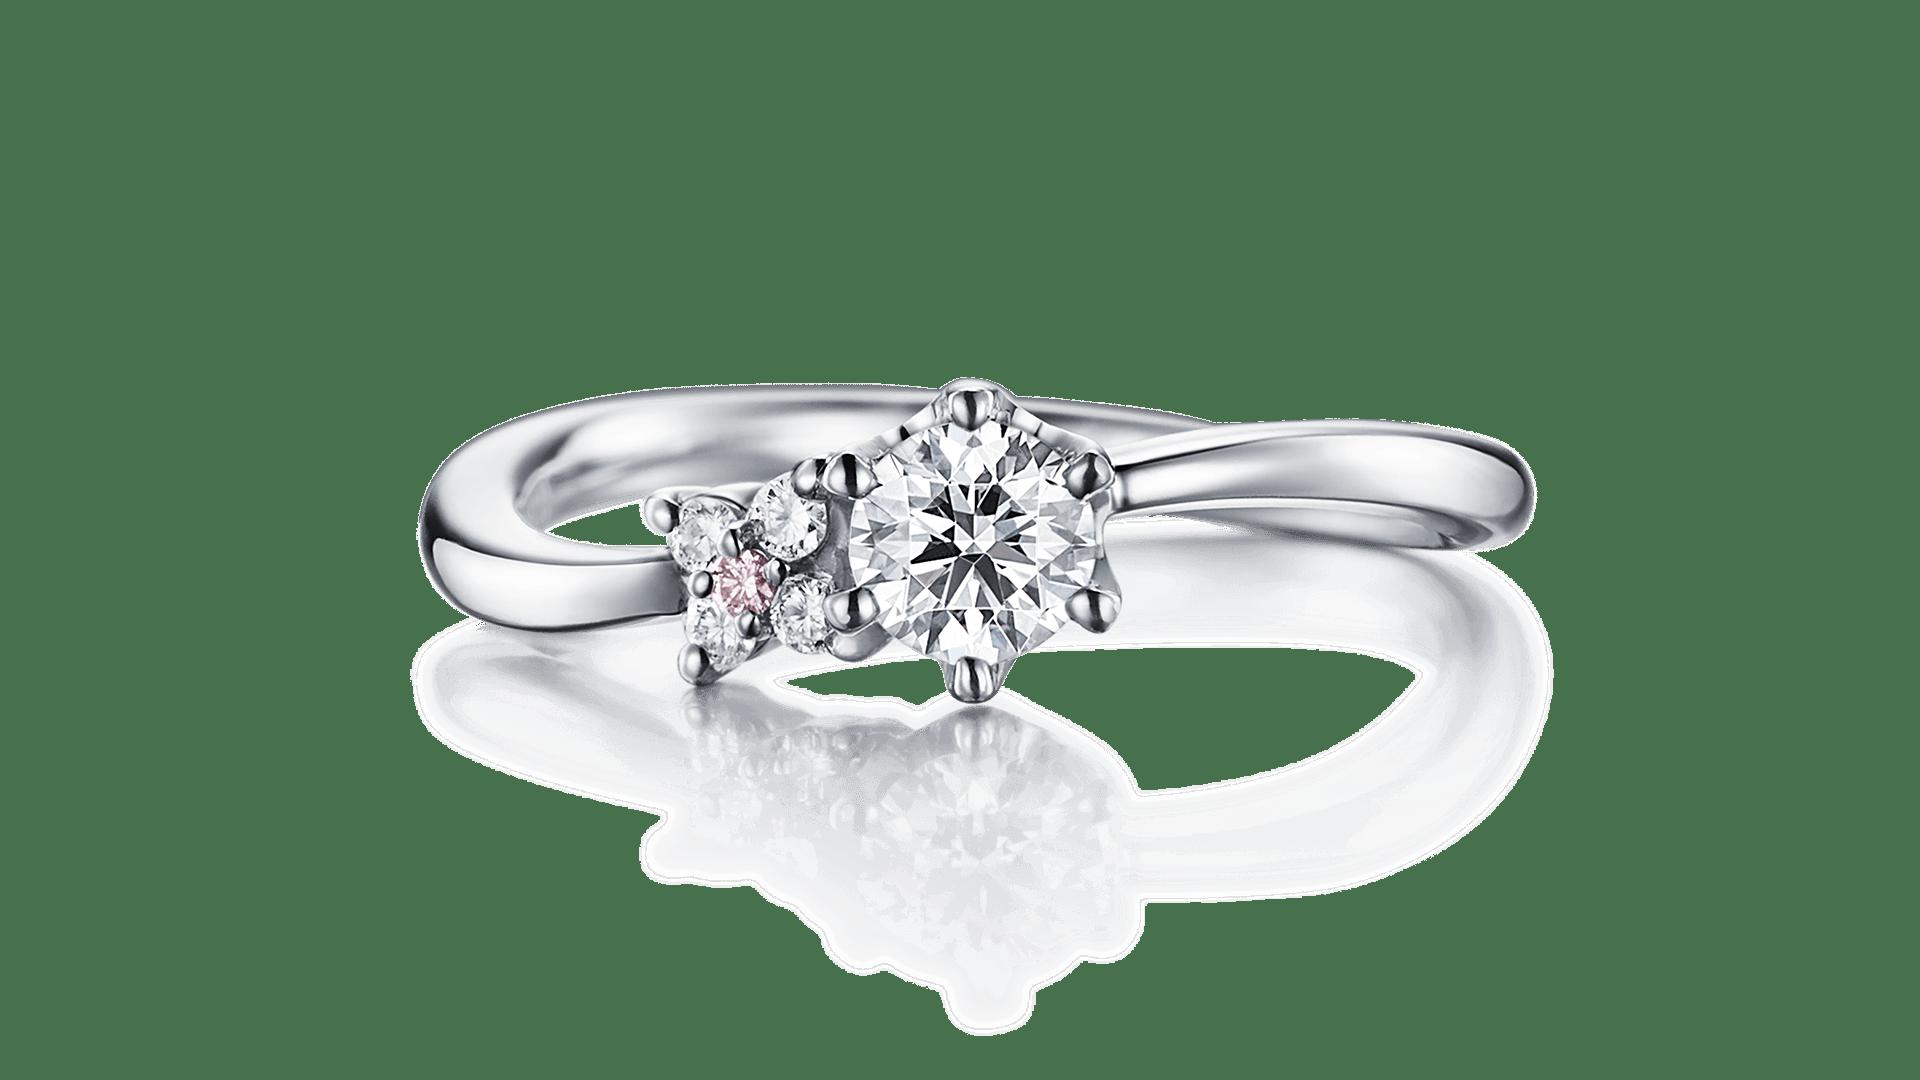 albireo アルビレオ | 婚約指輪サムネイル 1